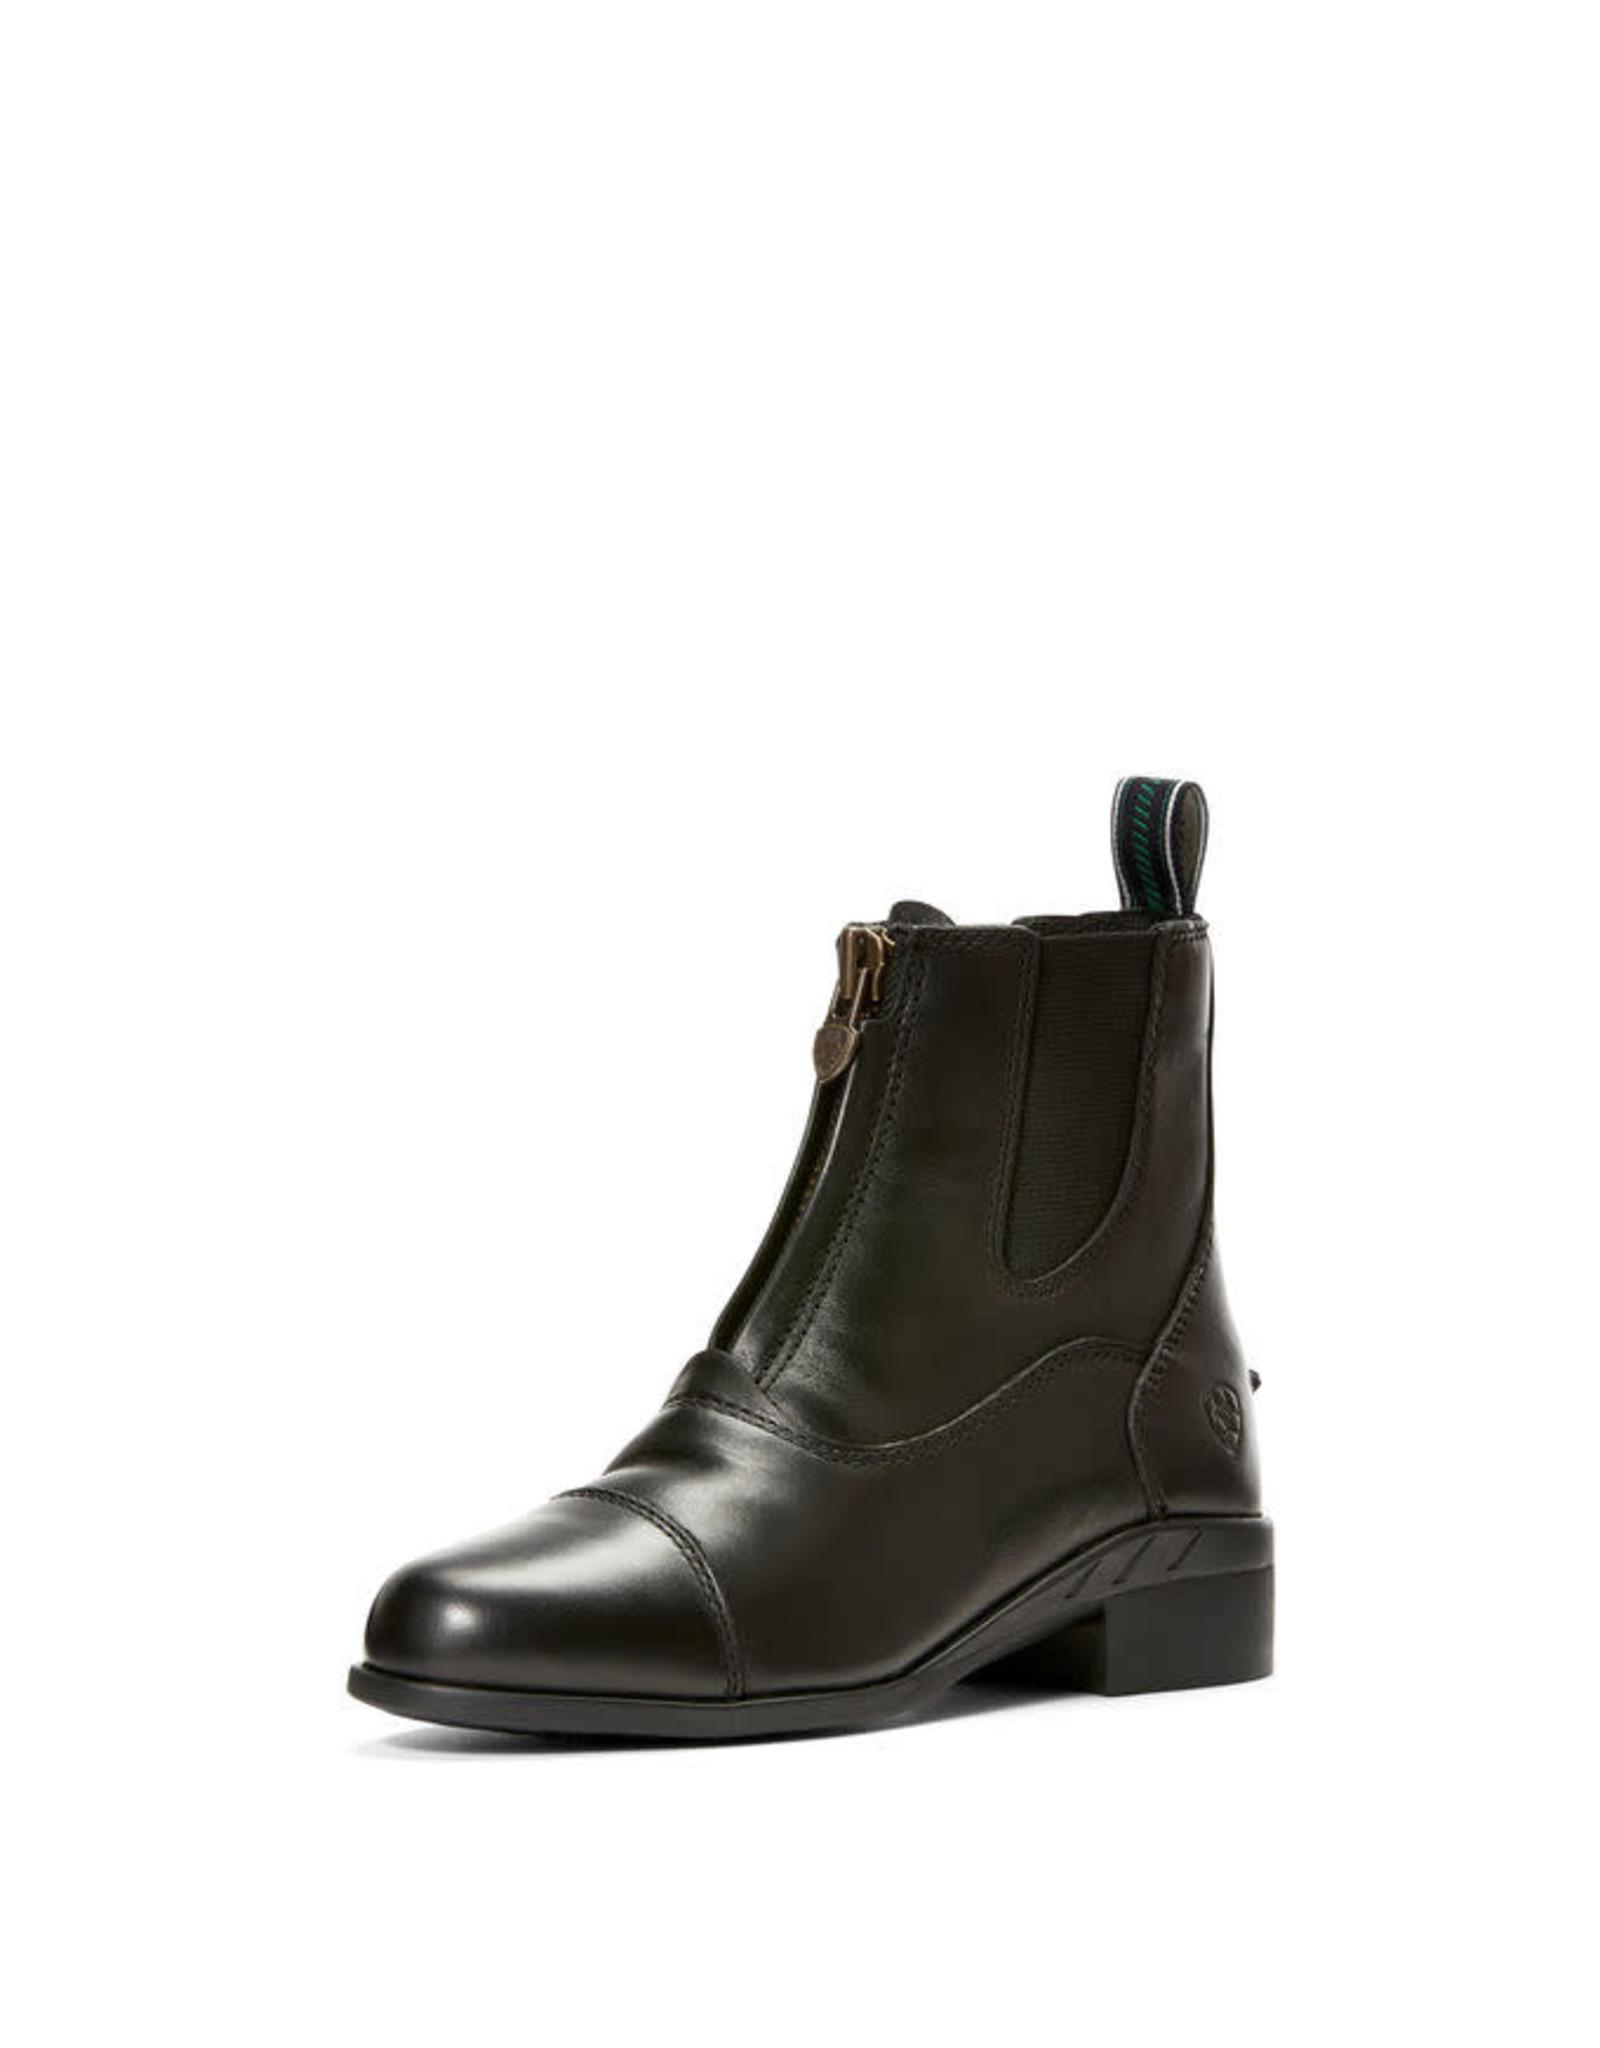 Ariat Devon IV Youth Paddock Boot Zip